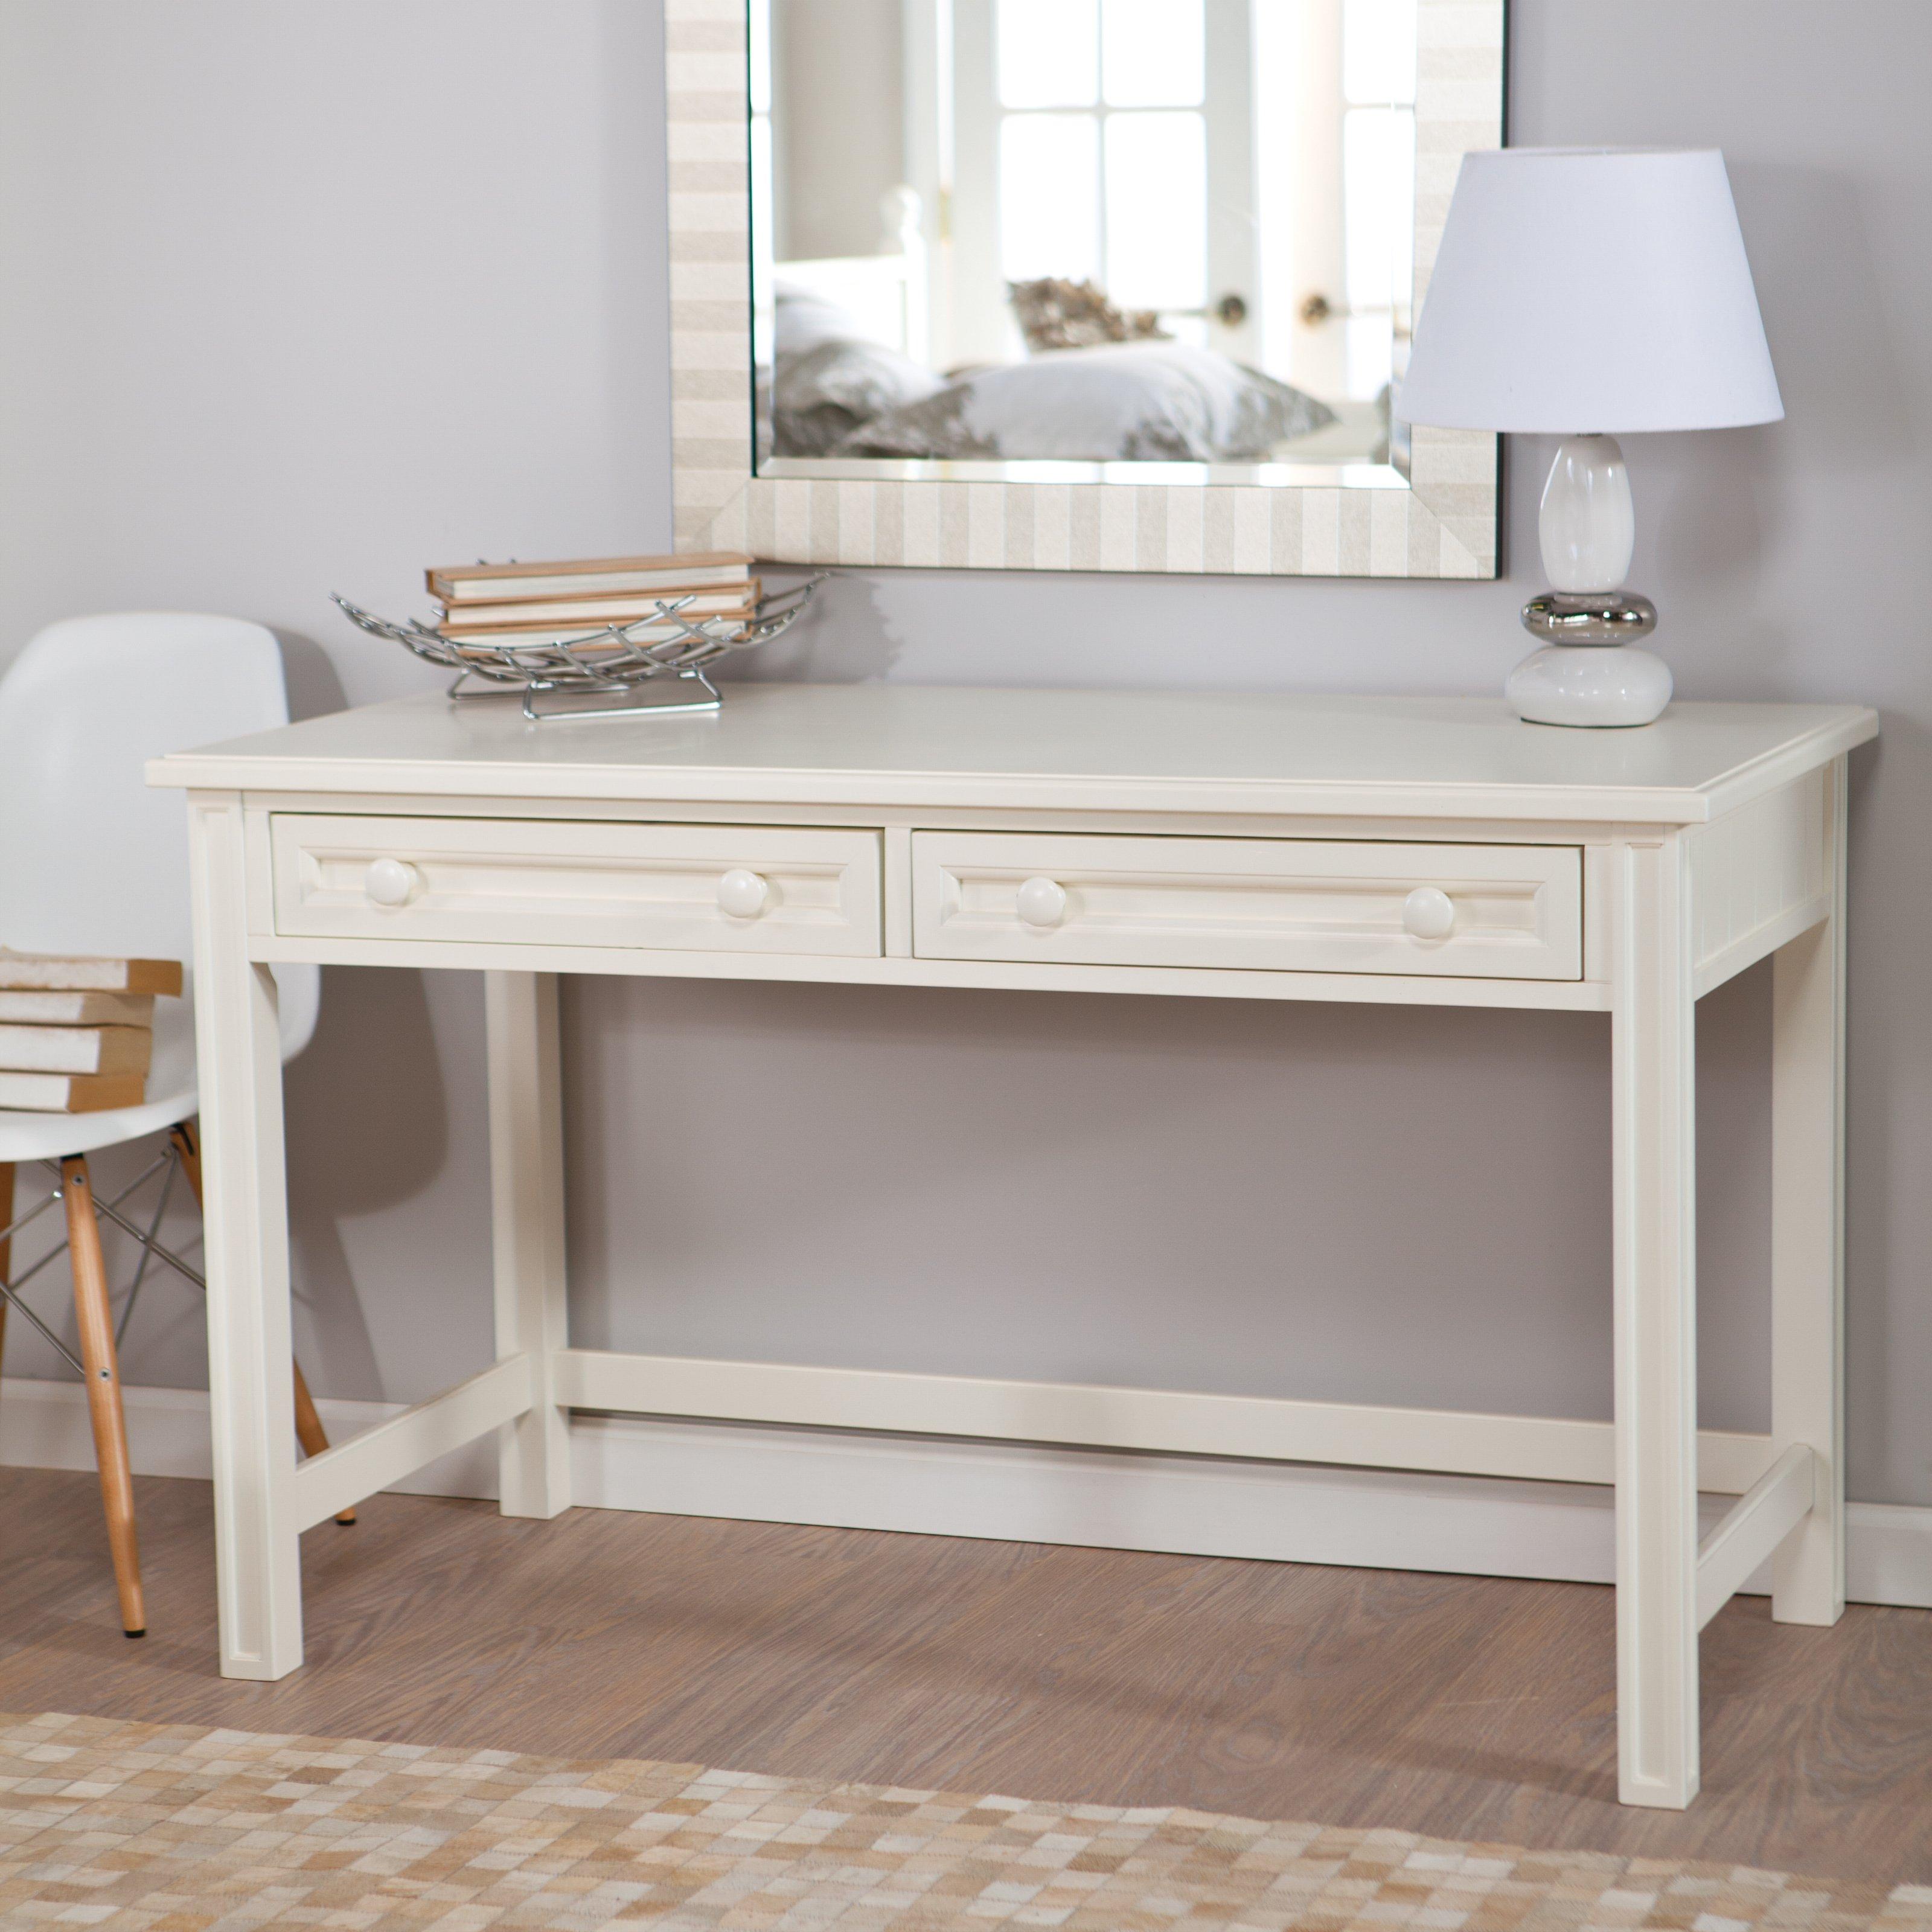 bedroom-vanity-table-desk